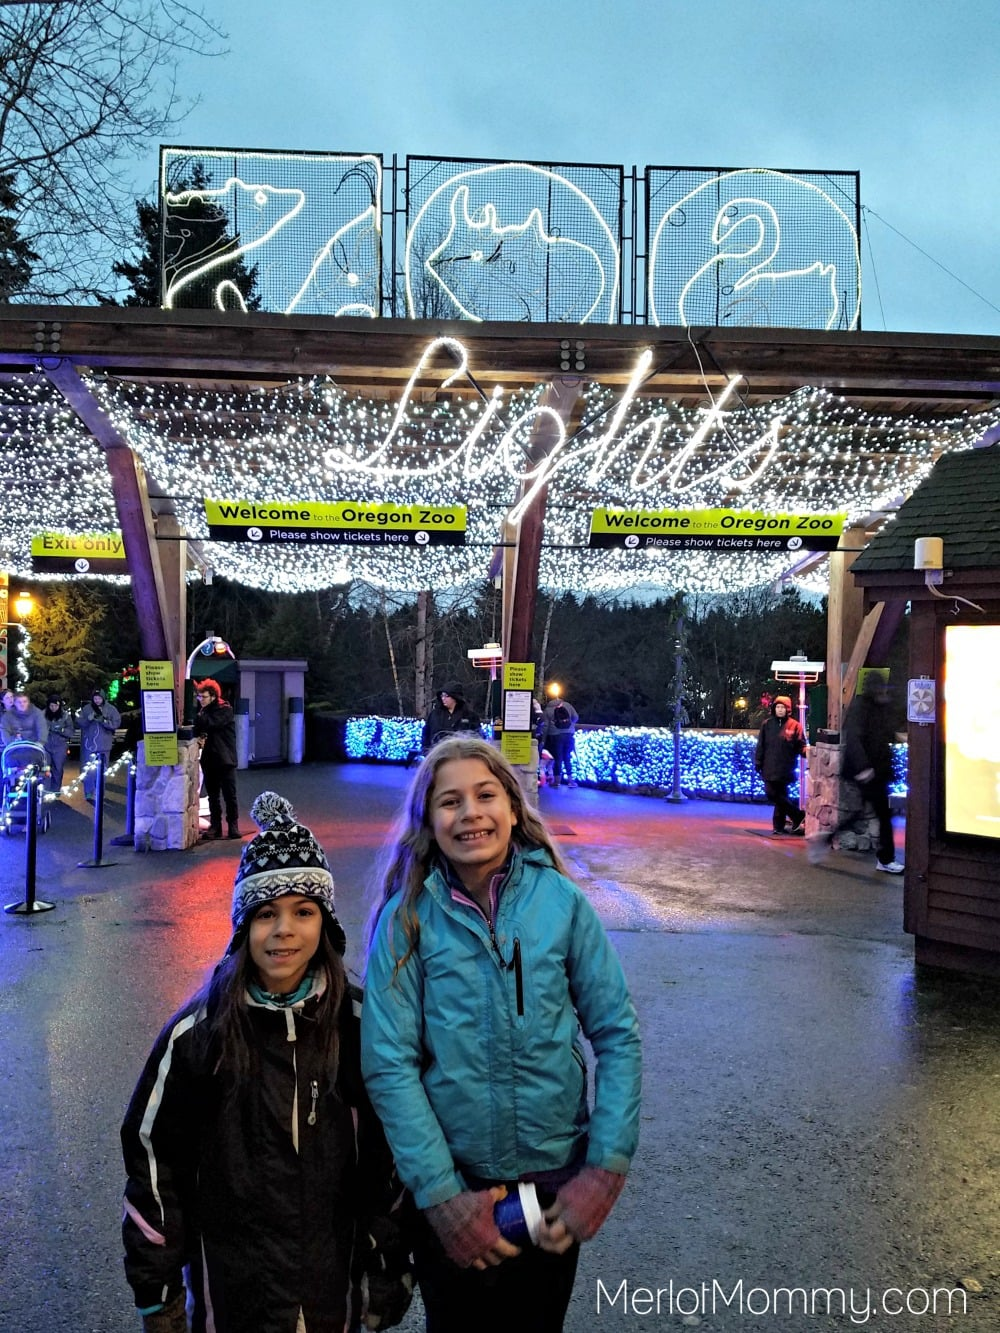 2016 Zoolights at the Oregon Zoo entrance